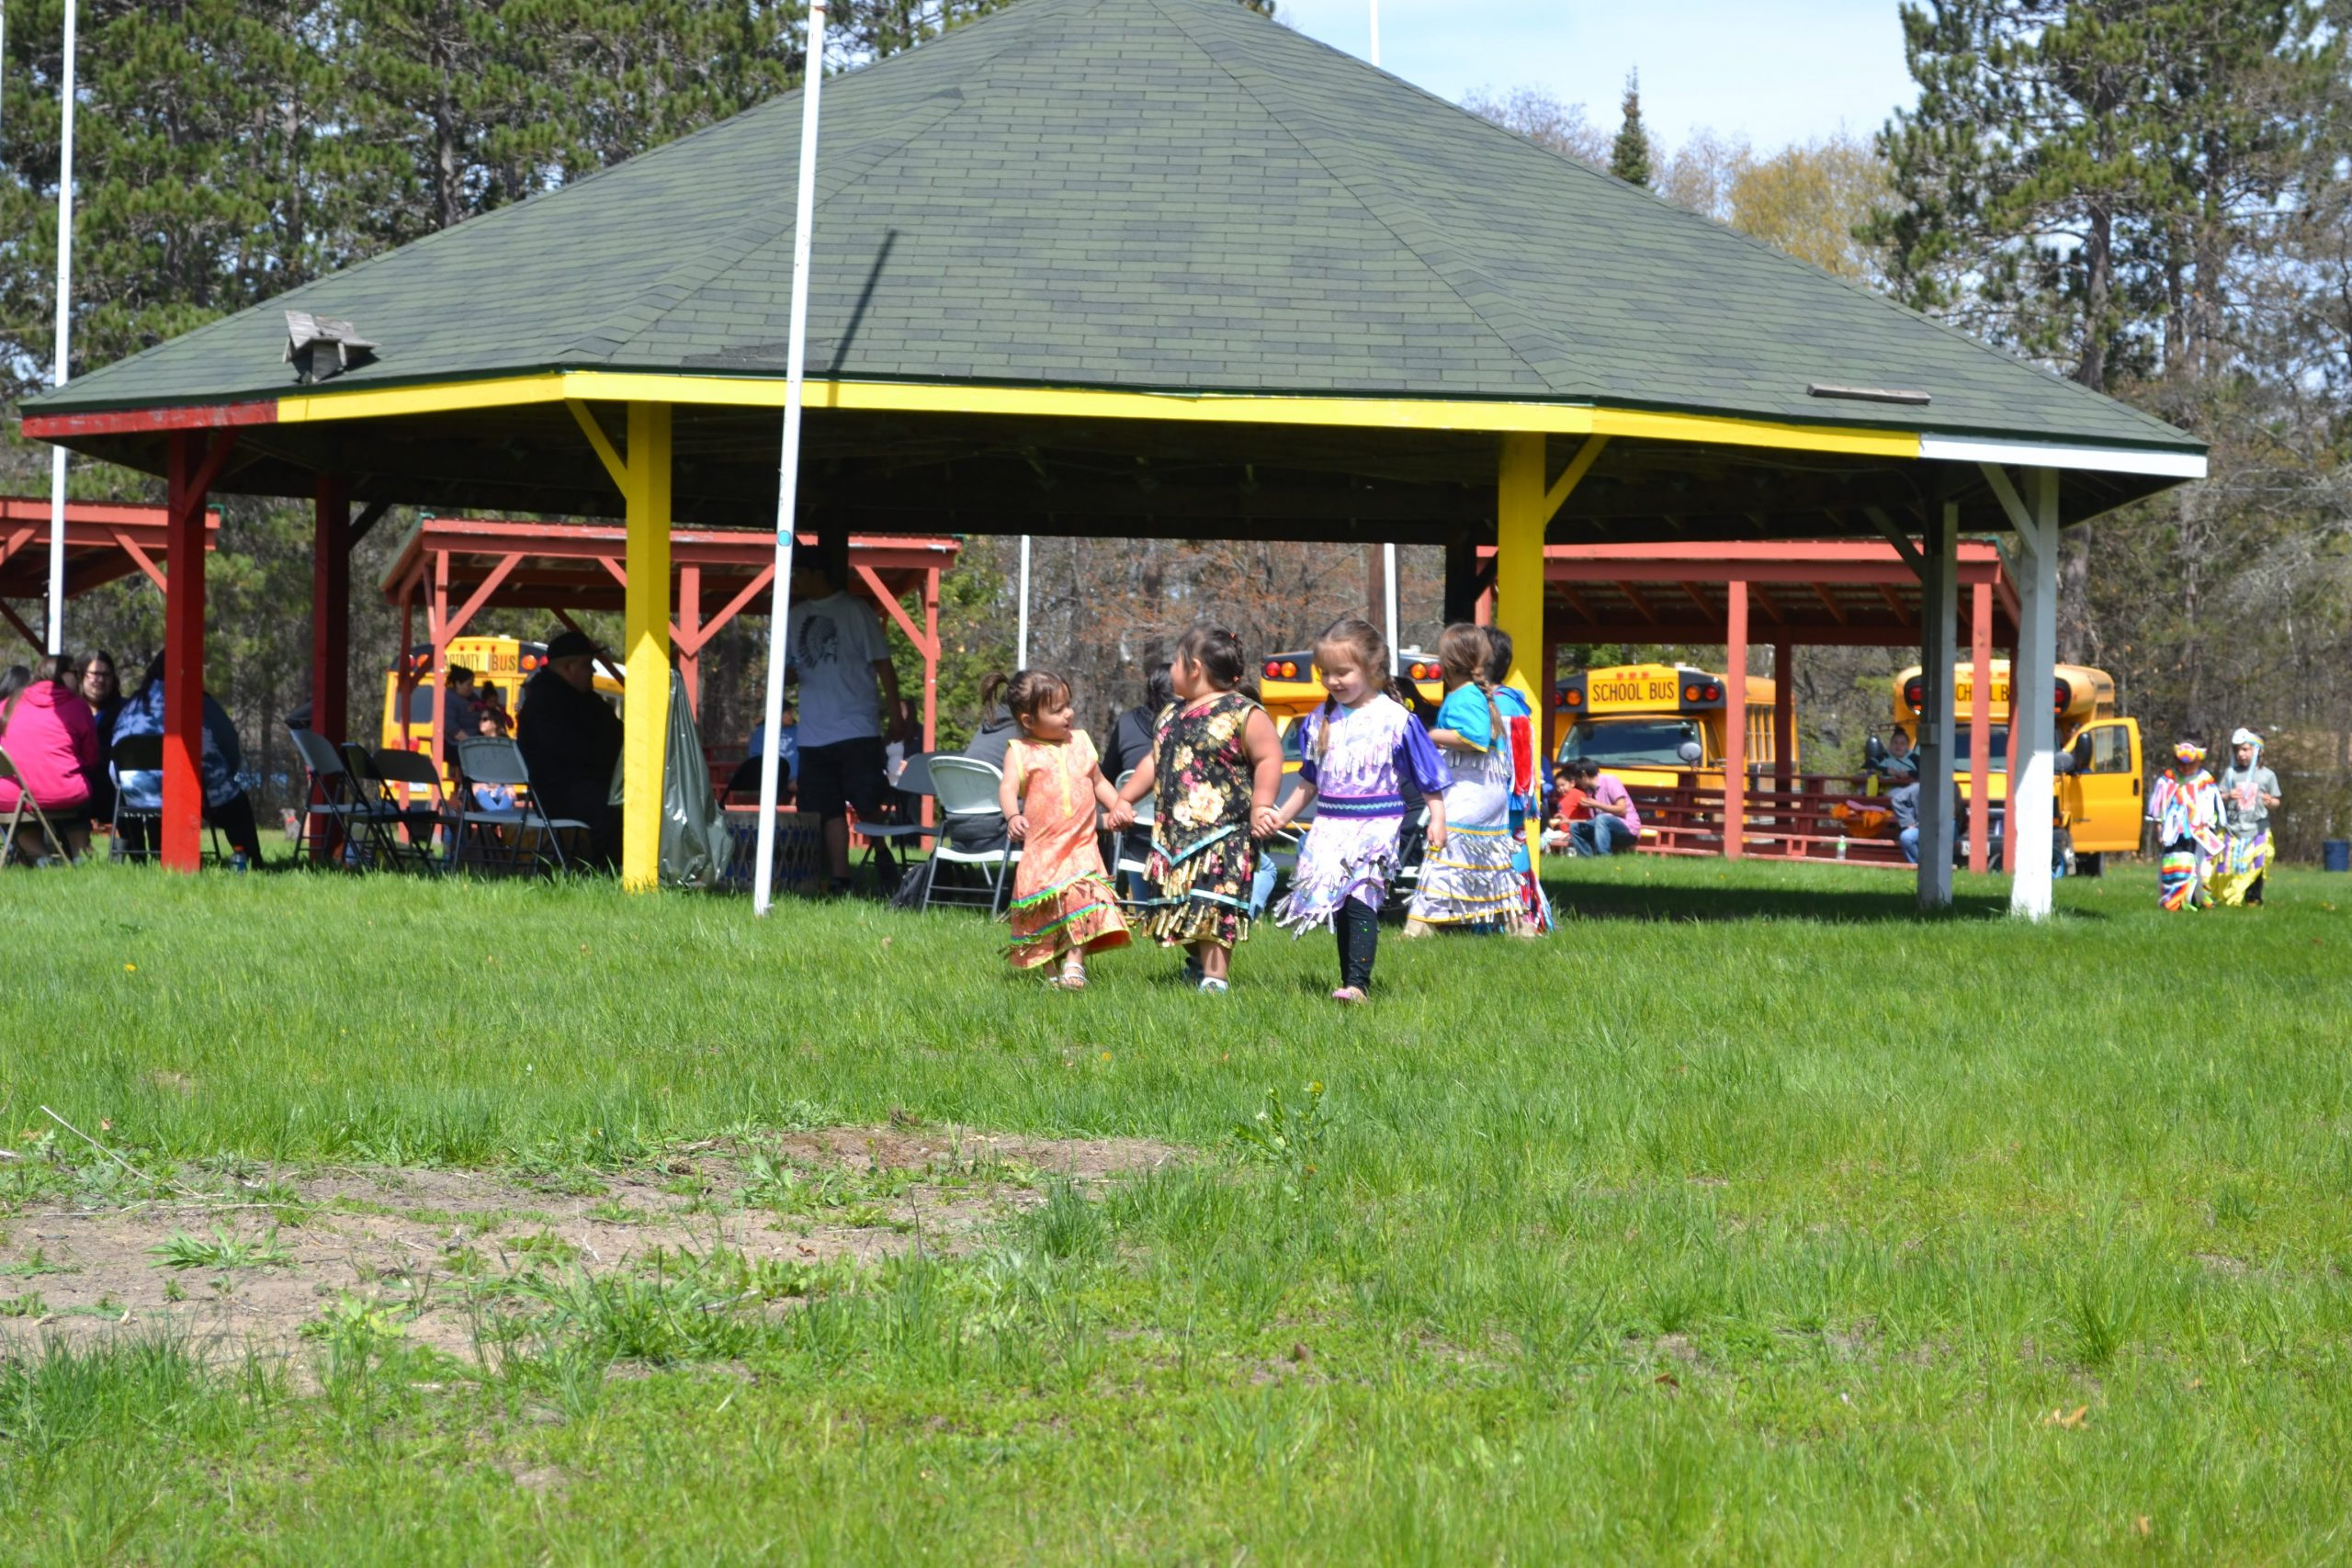 Outdoor event - Ojibwe culture